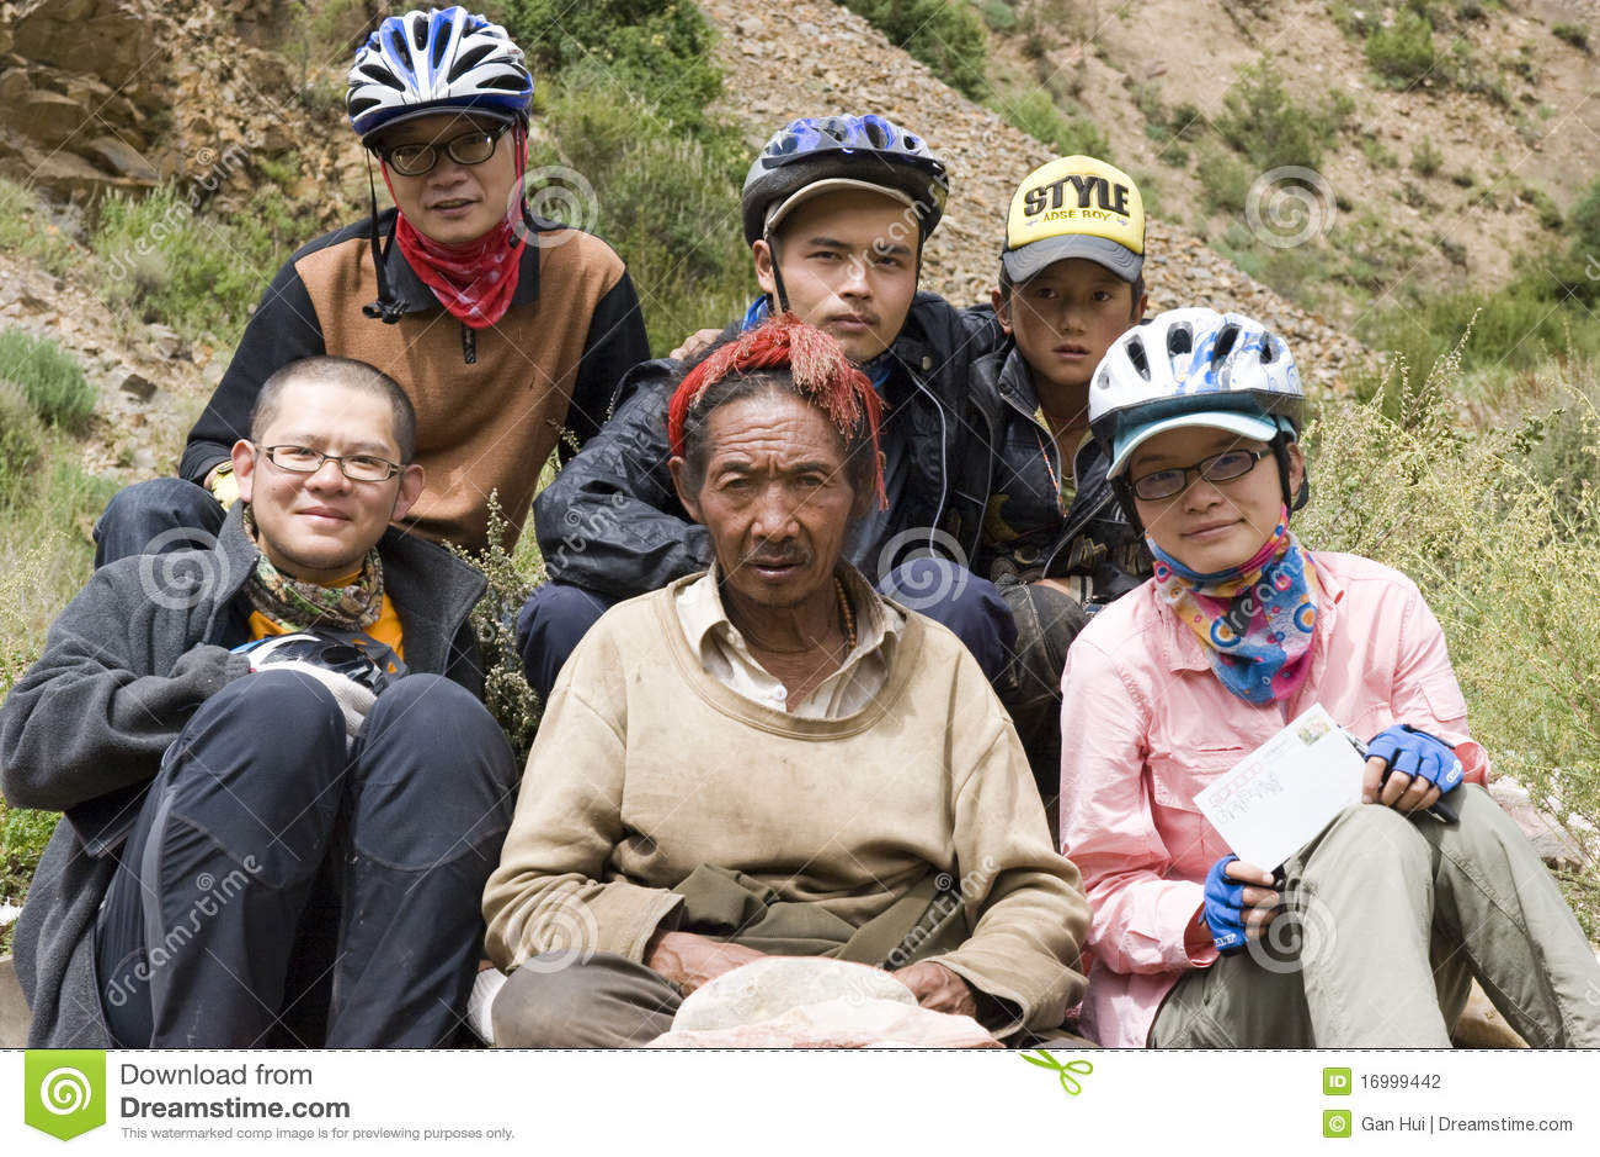 Group photo with Tibetan:Trip to Tibet